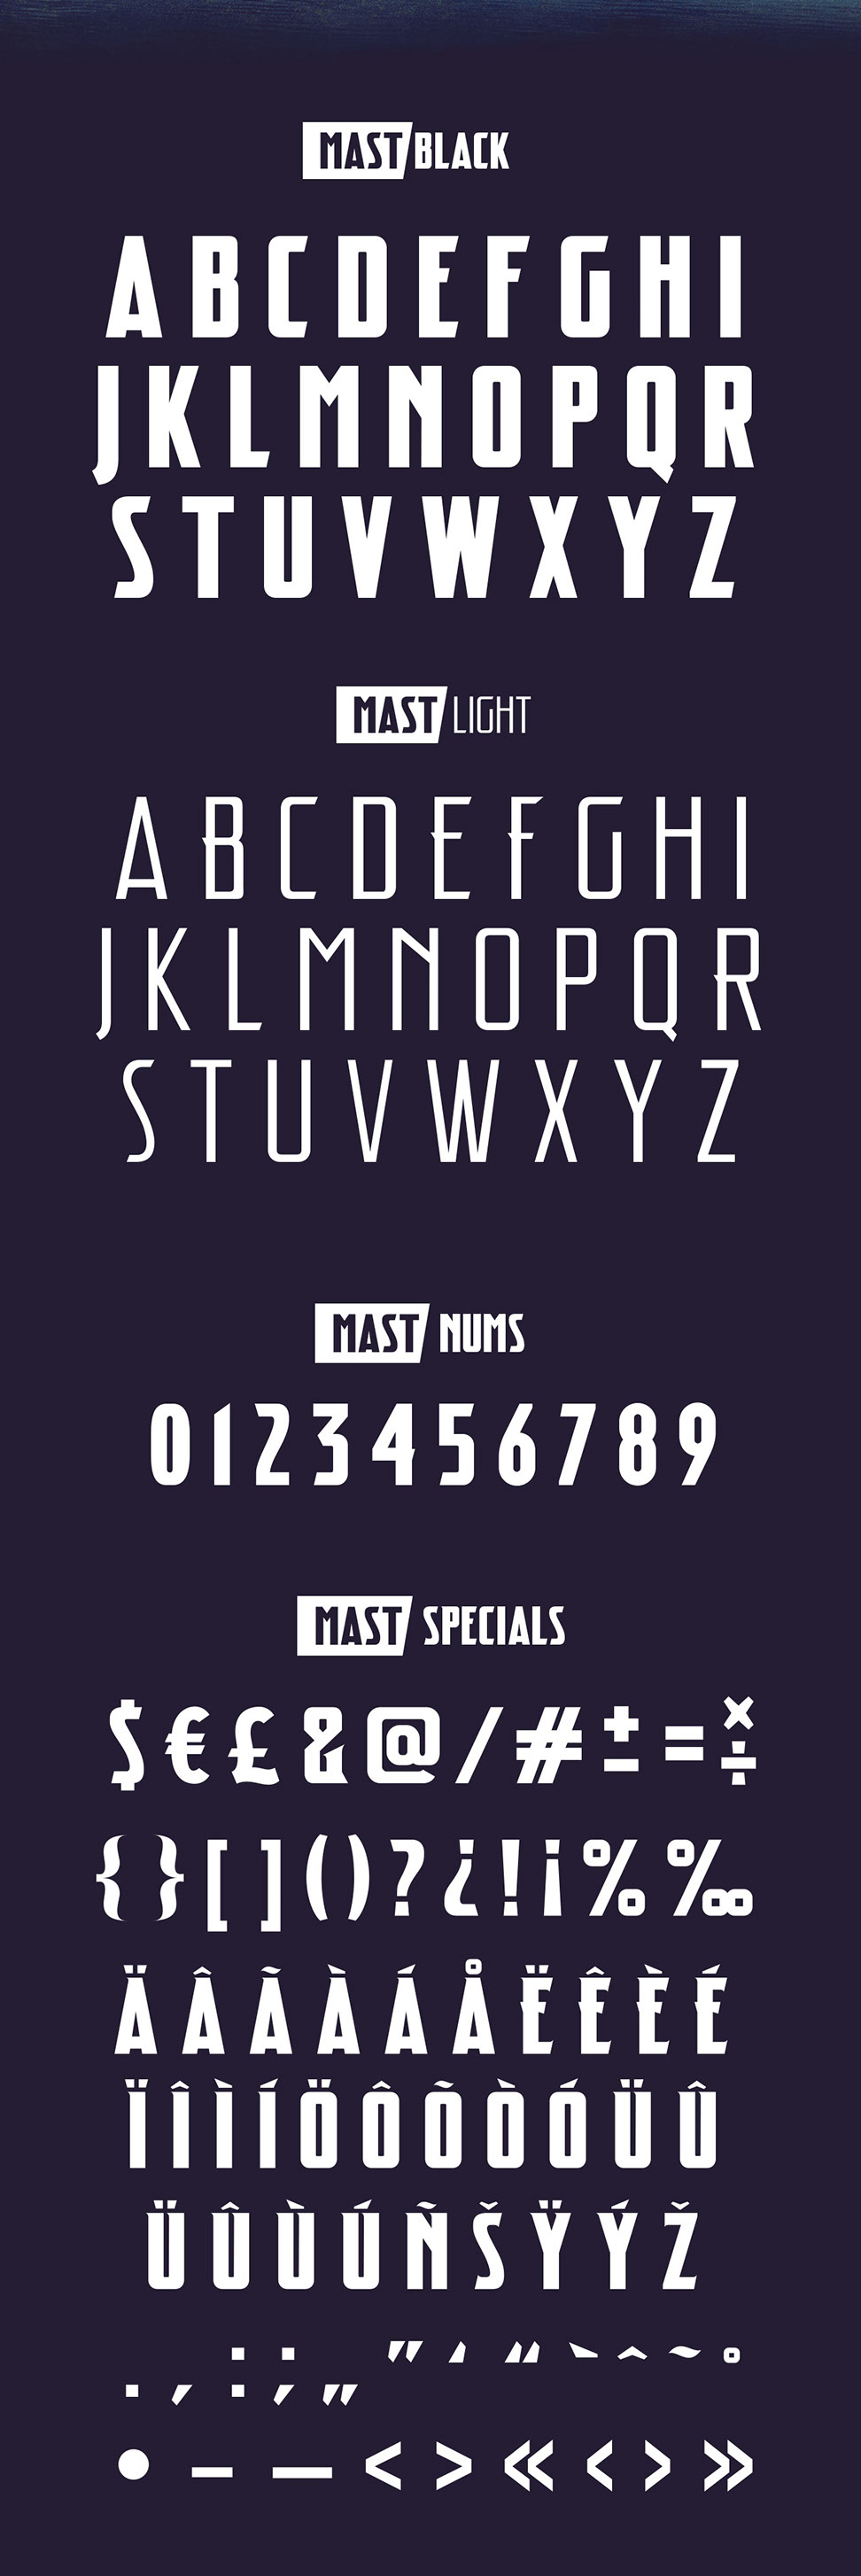 Mast Free Font Letters